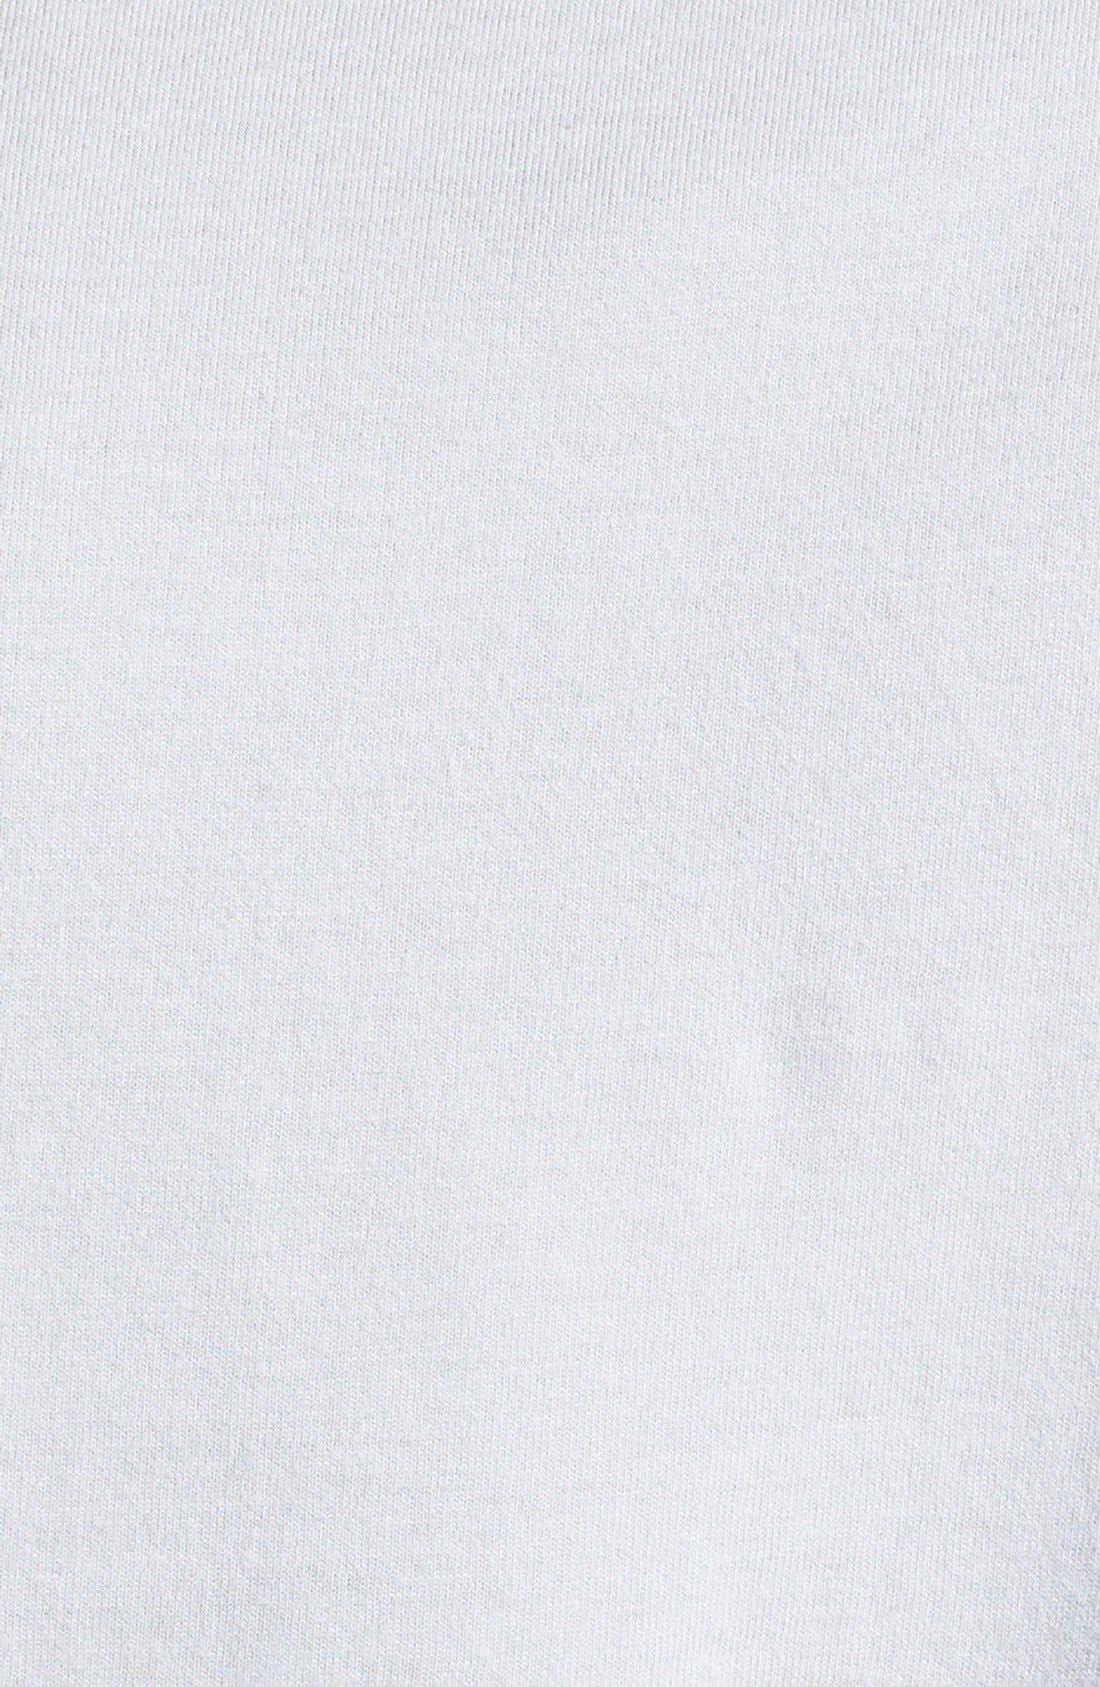 Alternate Image 3  - Wright & Ditson 'Los Angeles Dodgers' V-Neck T-Shirt